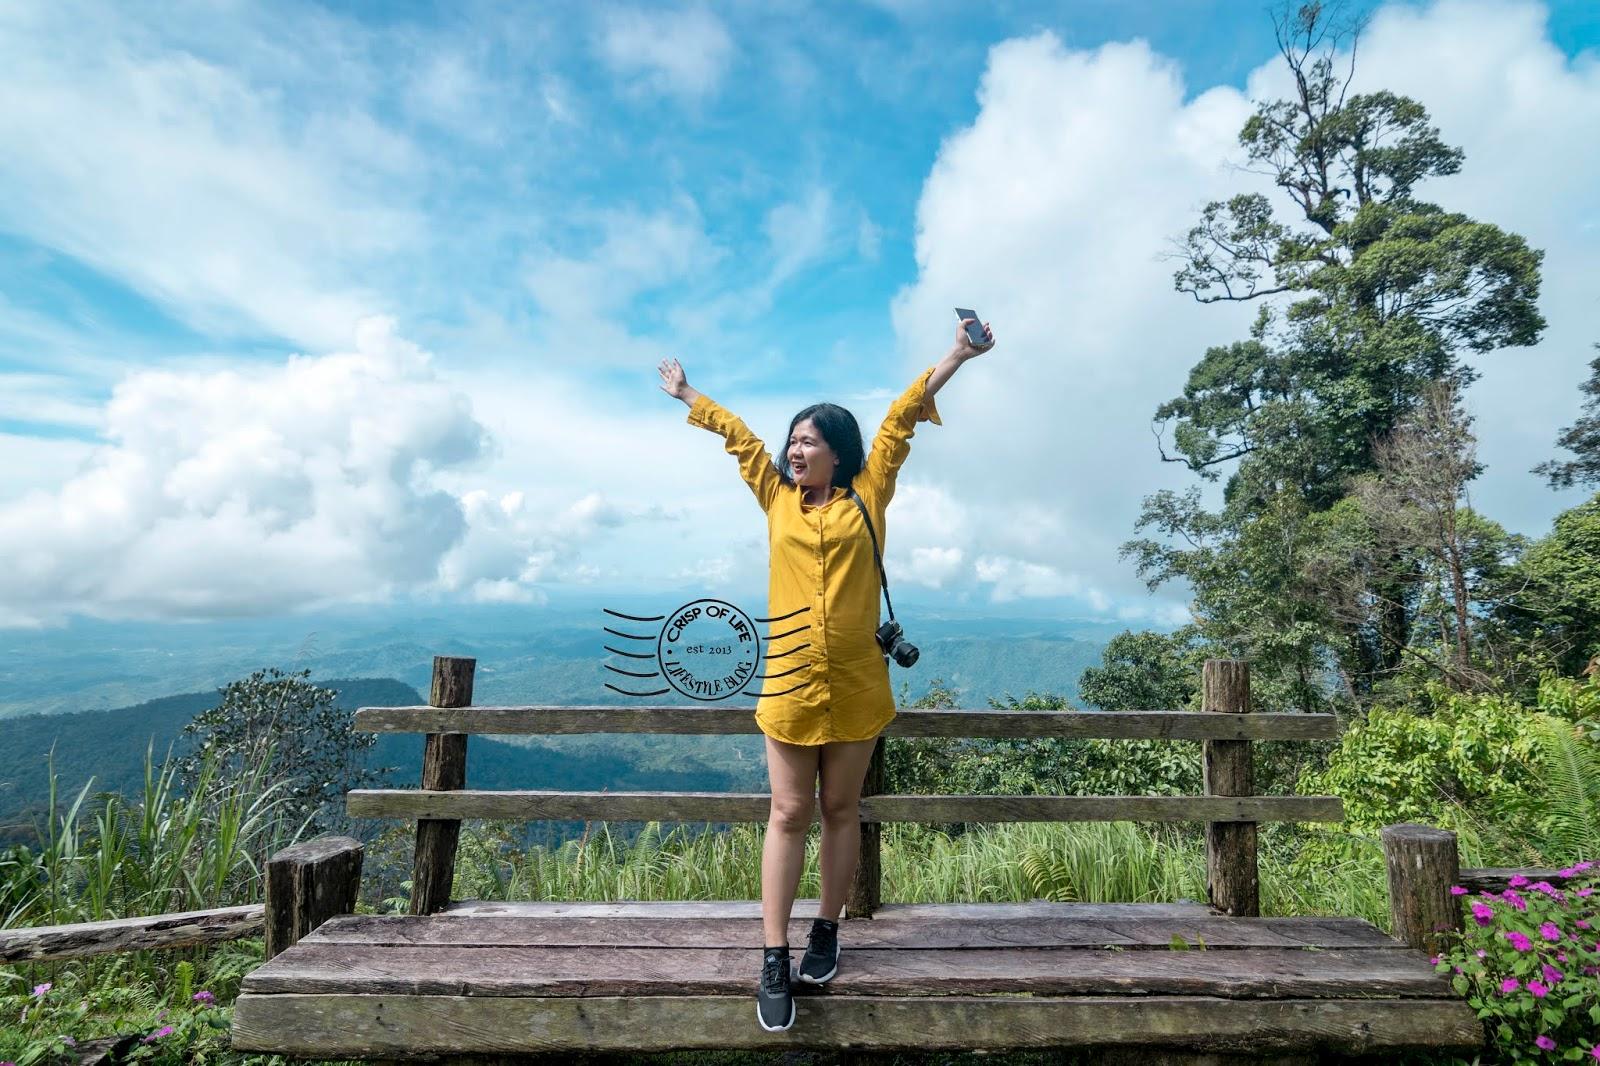 Borneo Highland Resort - A Least Known Attraction in Kuching, Sarawak